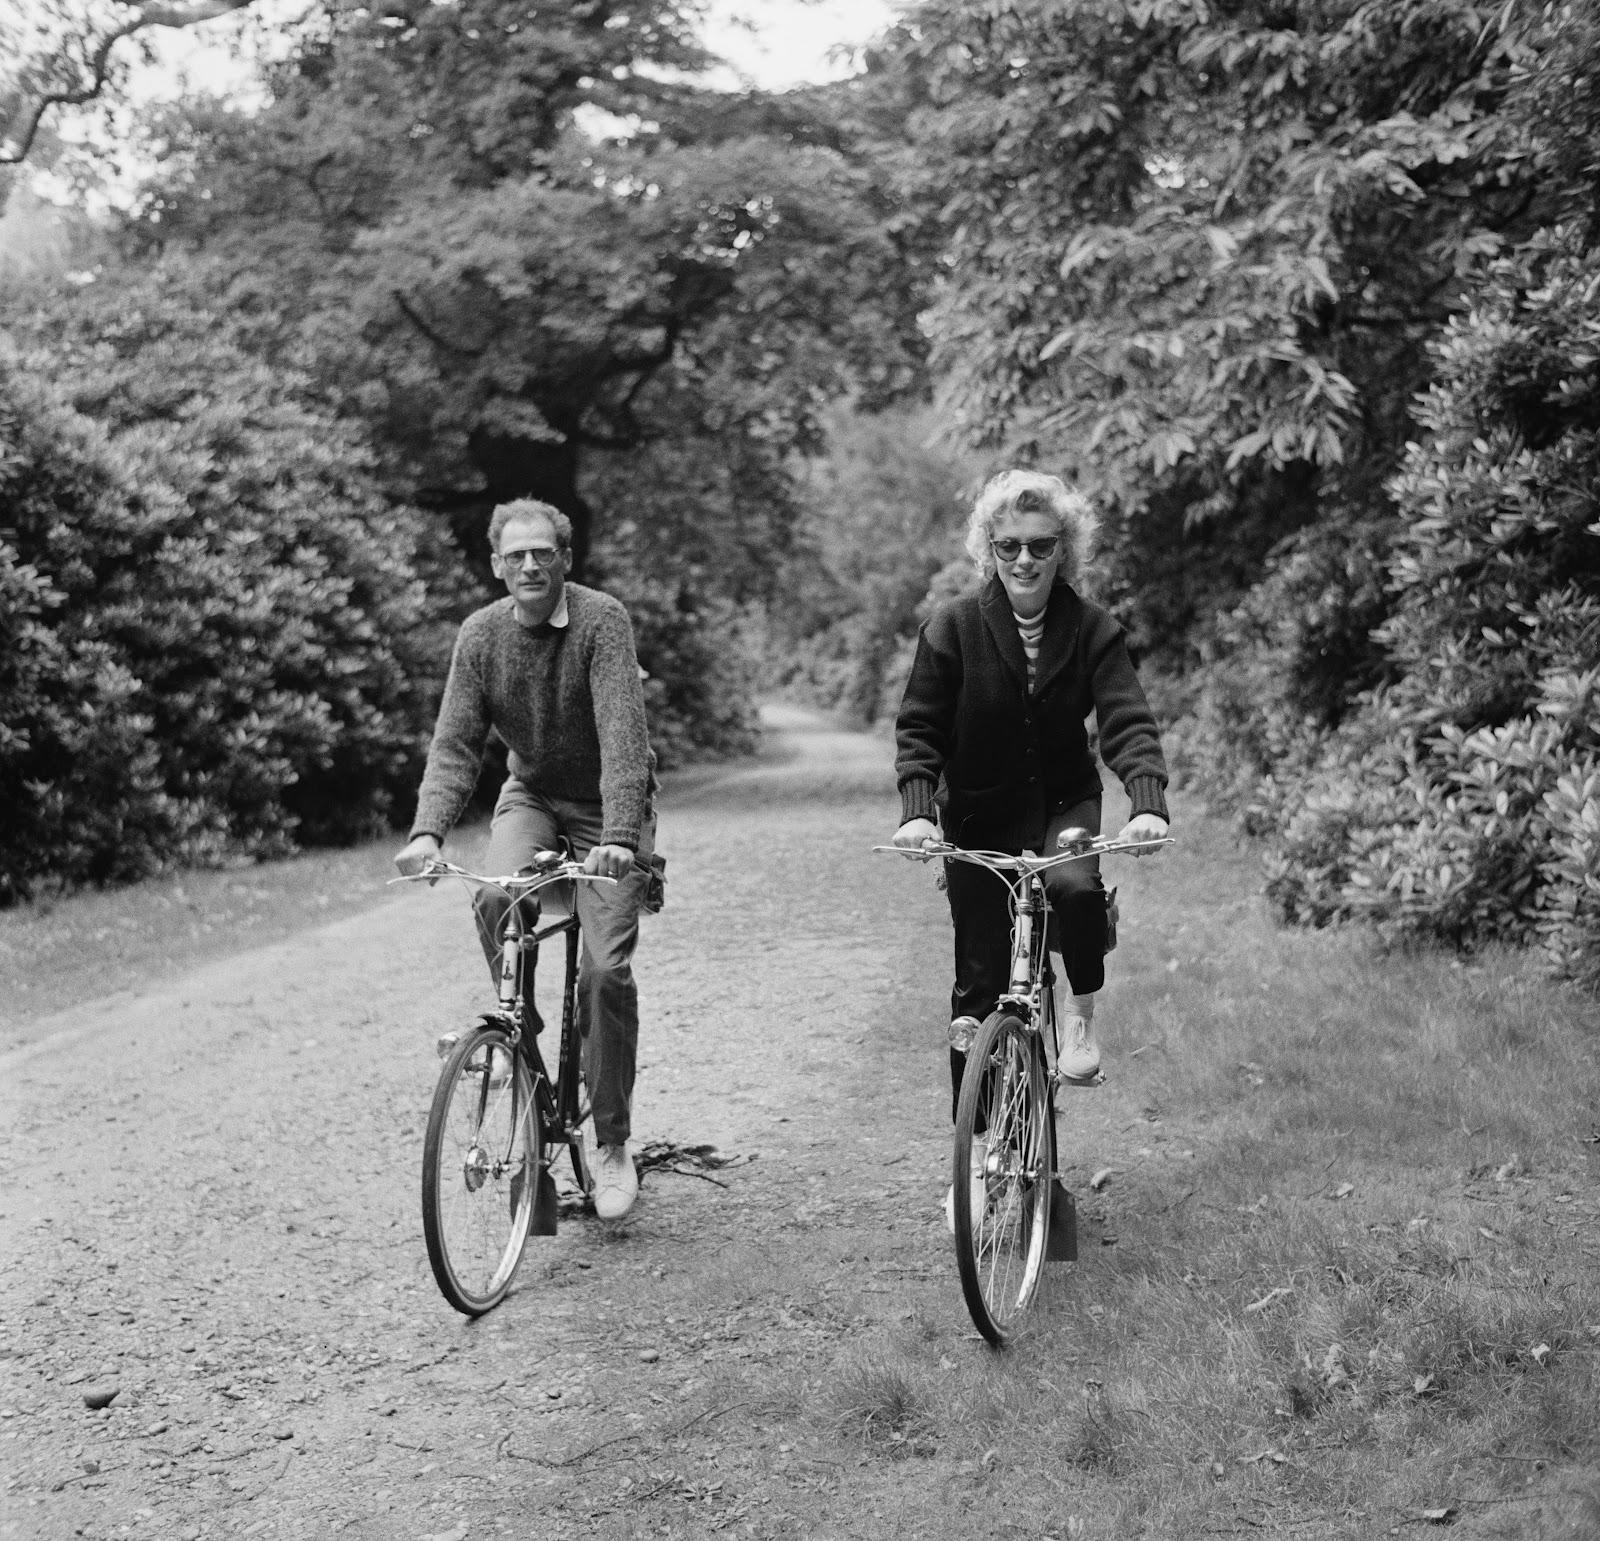 http://1.bp.blogspot.com/-khbkN1S_HSs/T4SYRyA_A1I/AAAAAAABB1E/C7kF35XN4k4/s1600/Marilyn+Monroe+and+Arthur+Miller+bike+ride+cardigan+sunglasses.jpg